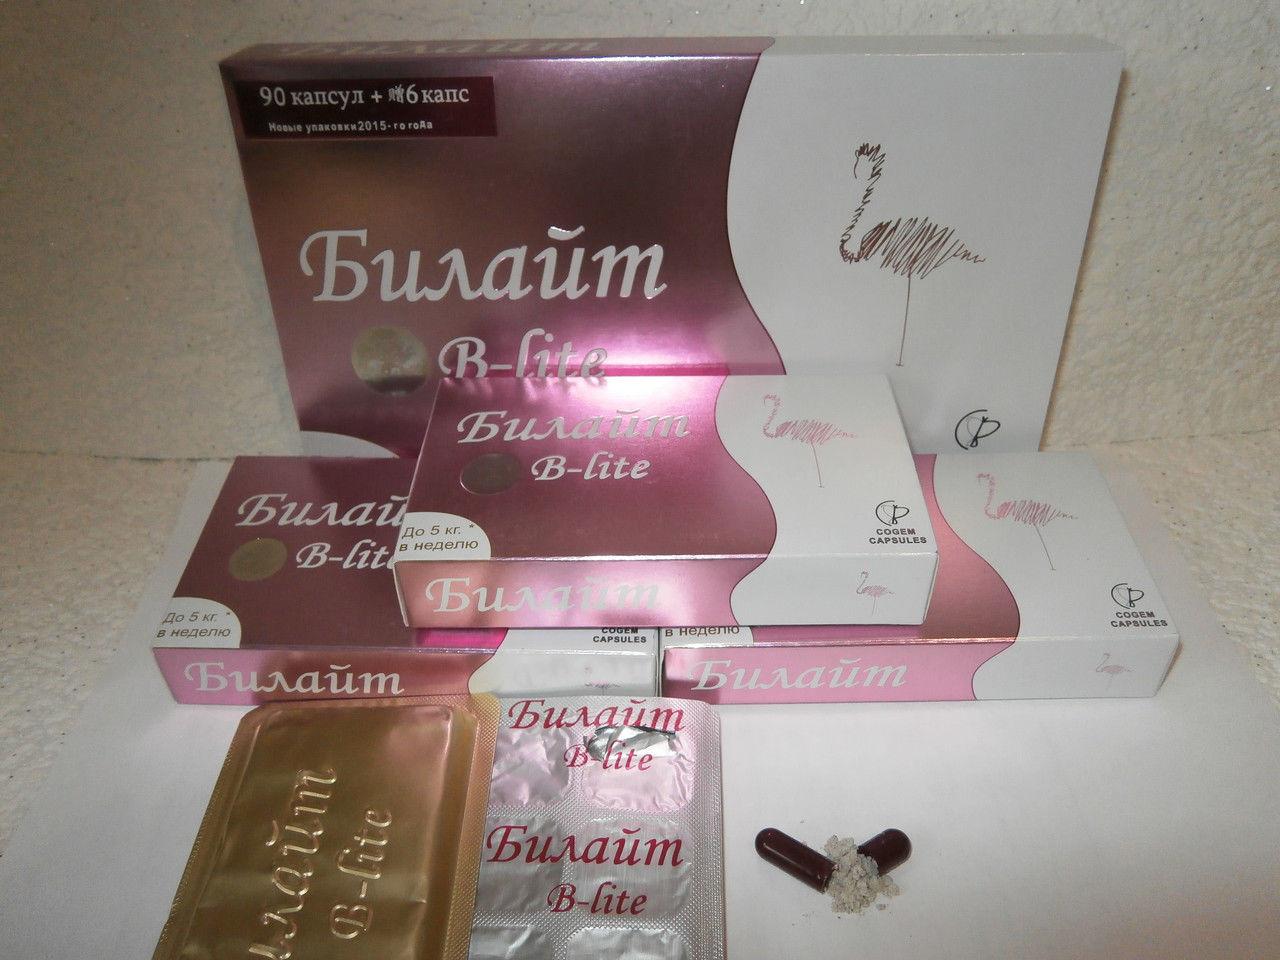 Билайт содержит сибутрамин